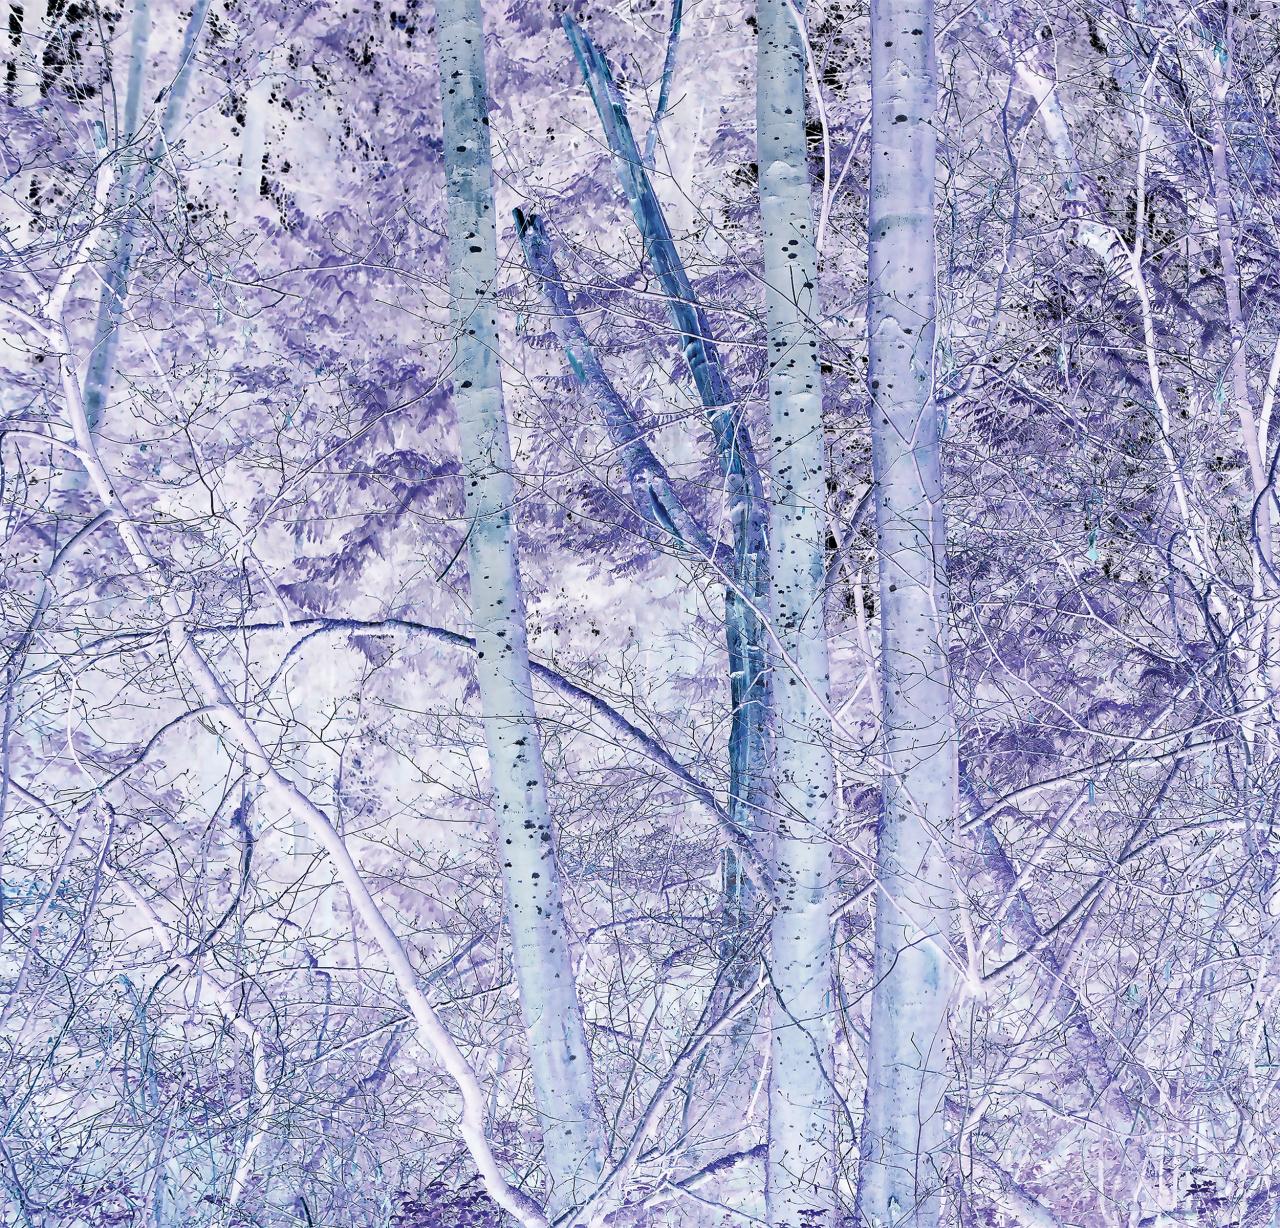 Hua Jin, Forest (inverse detail), 2017. Inkjet print, 30 x 30.